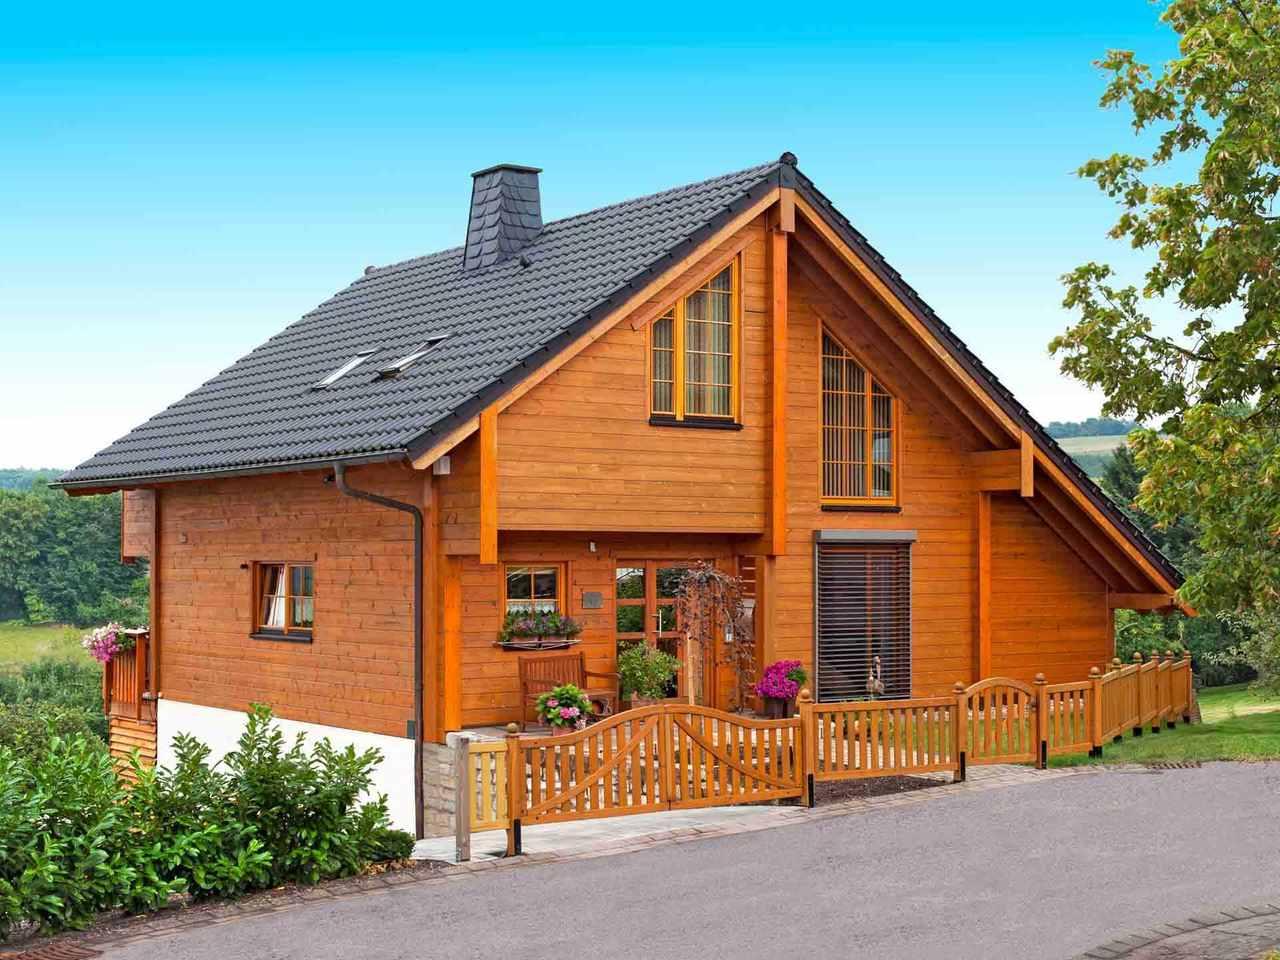 Musterhaus Dhrontalblick - Fulllwood Wohnblockhaus